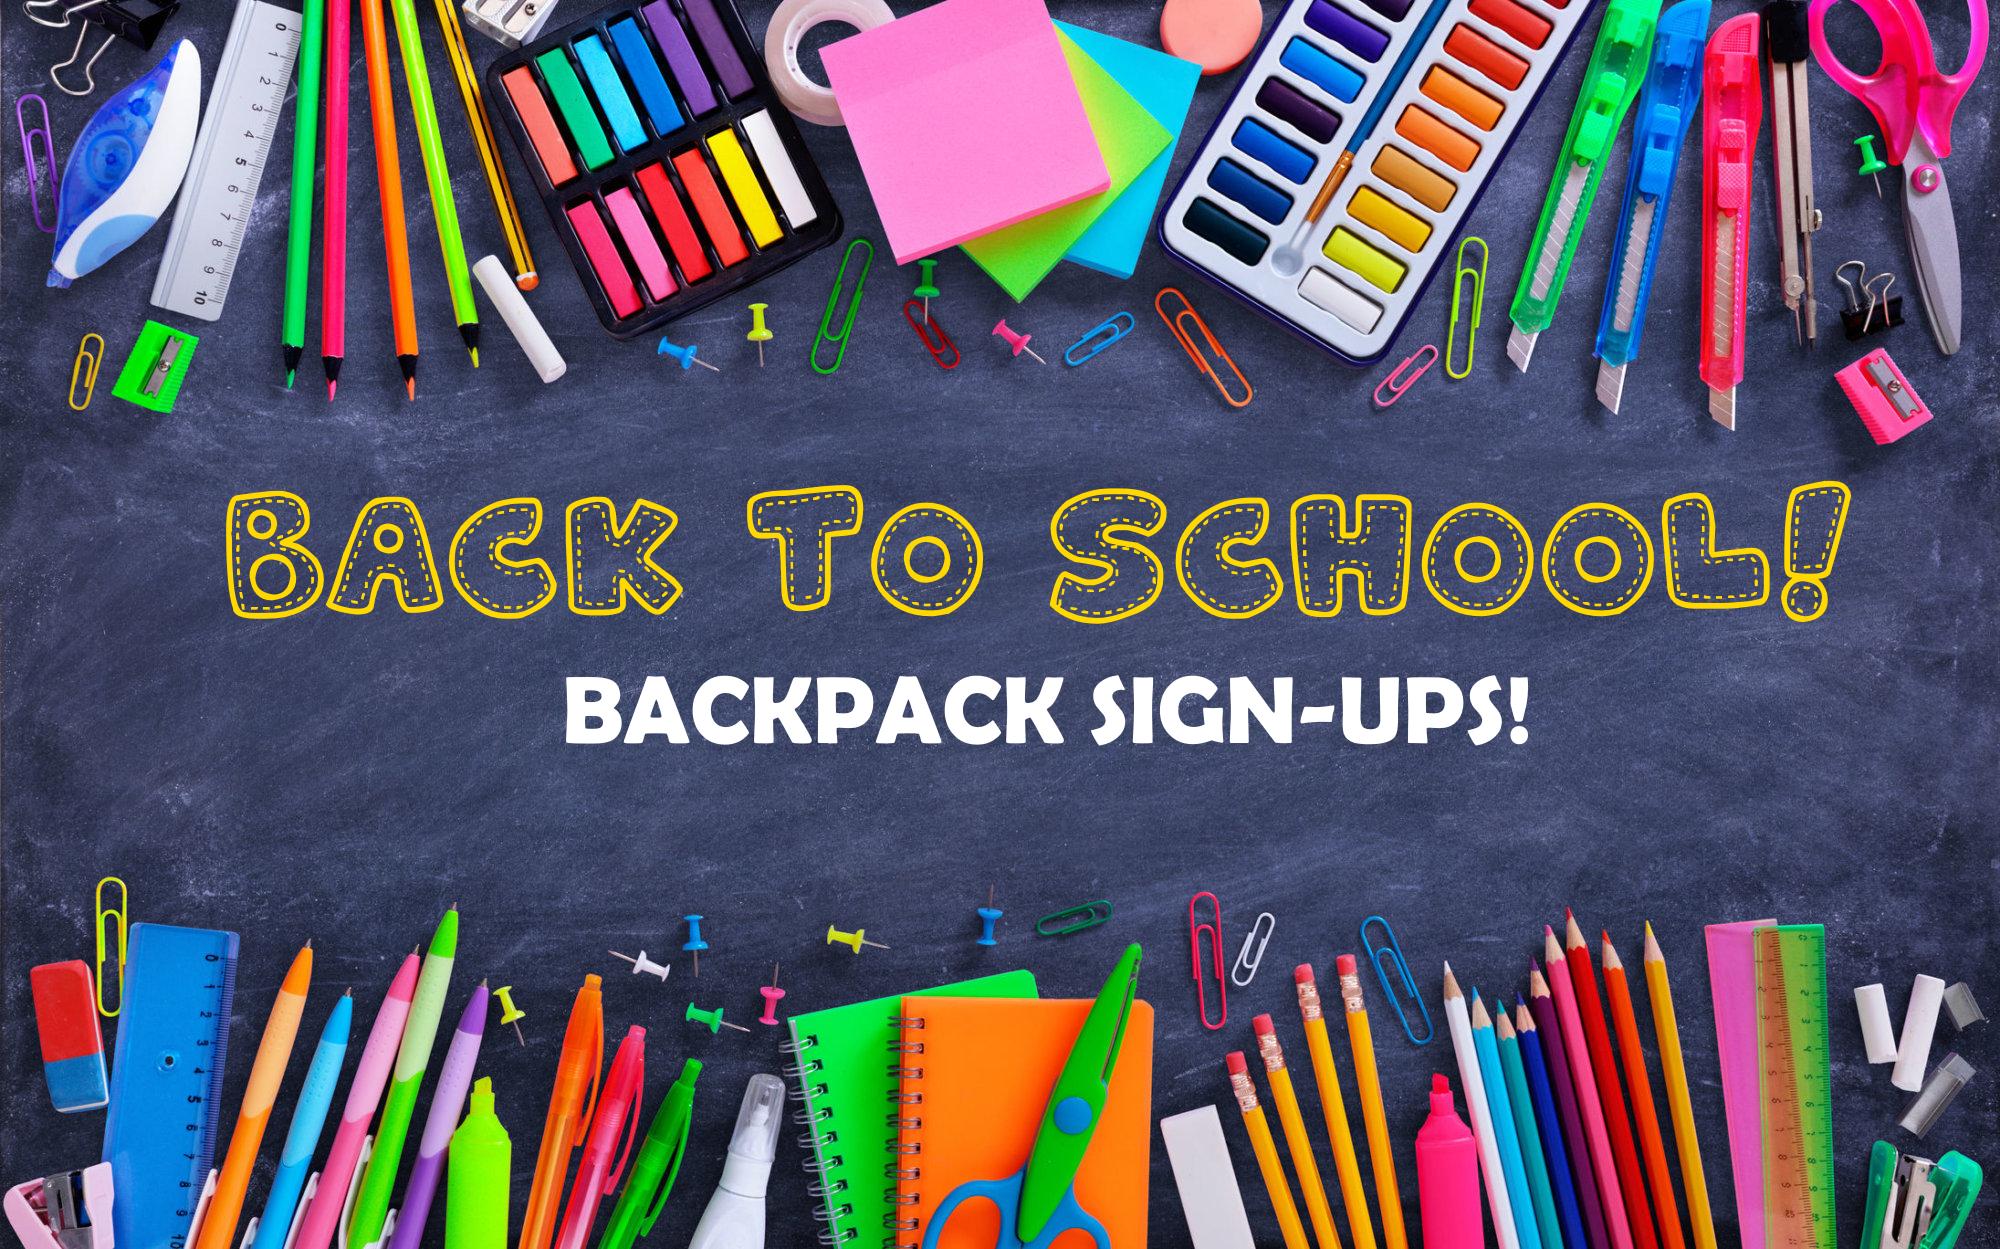 2021 Back to School Backpack Sign-ups!